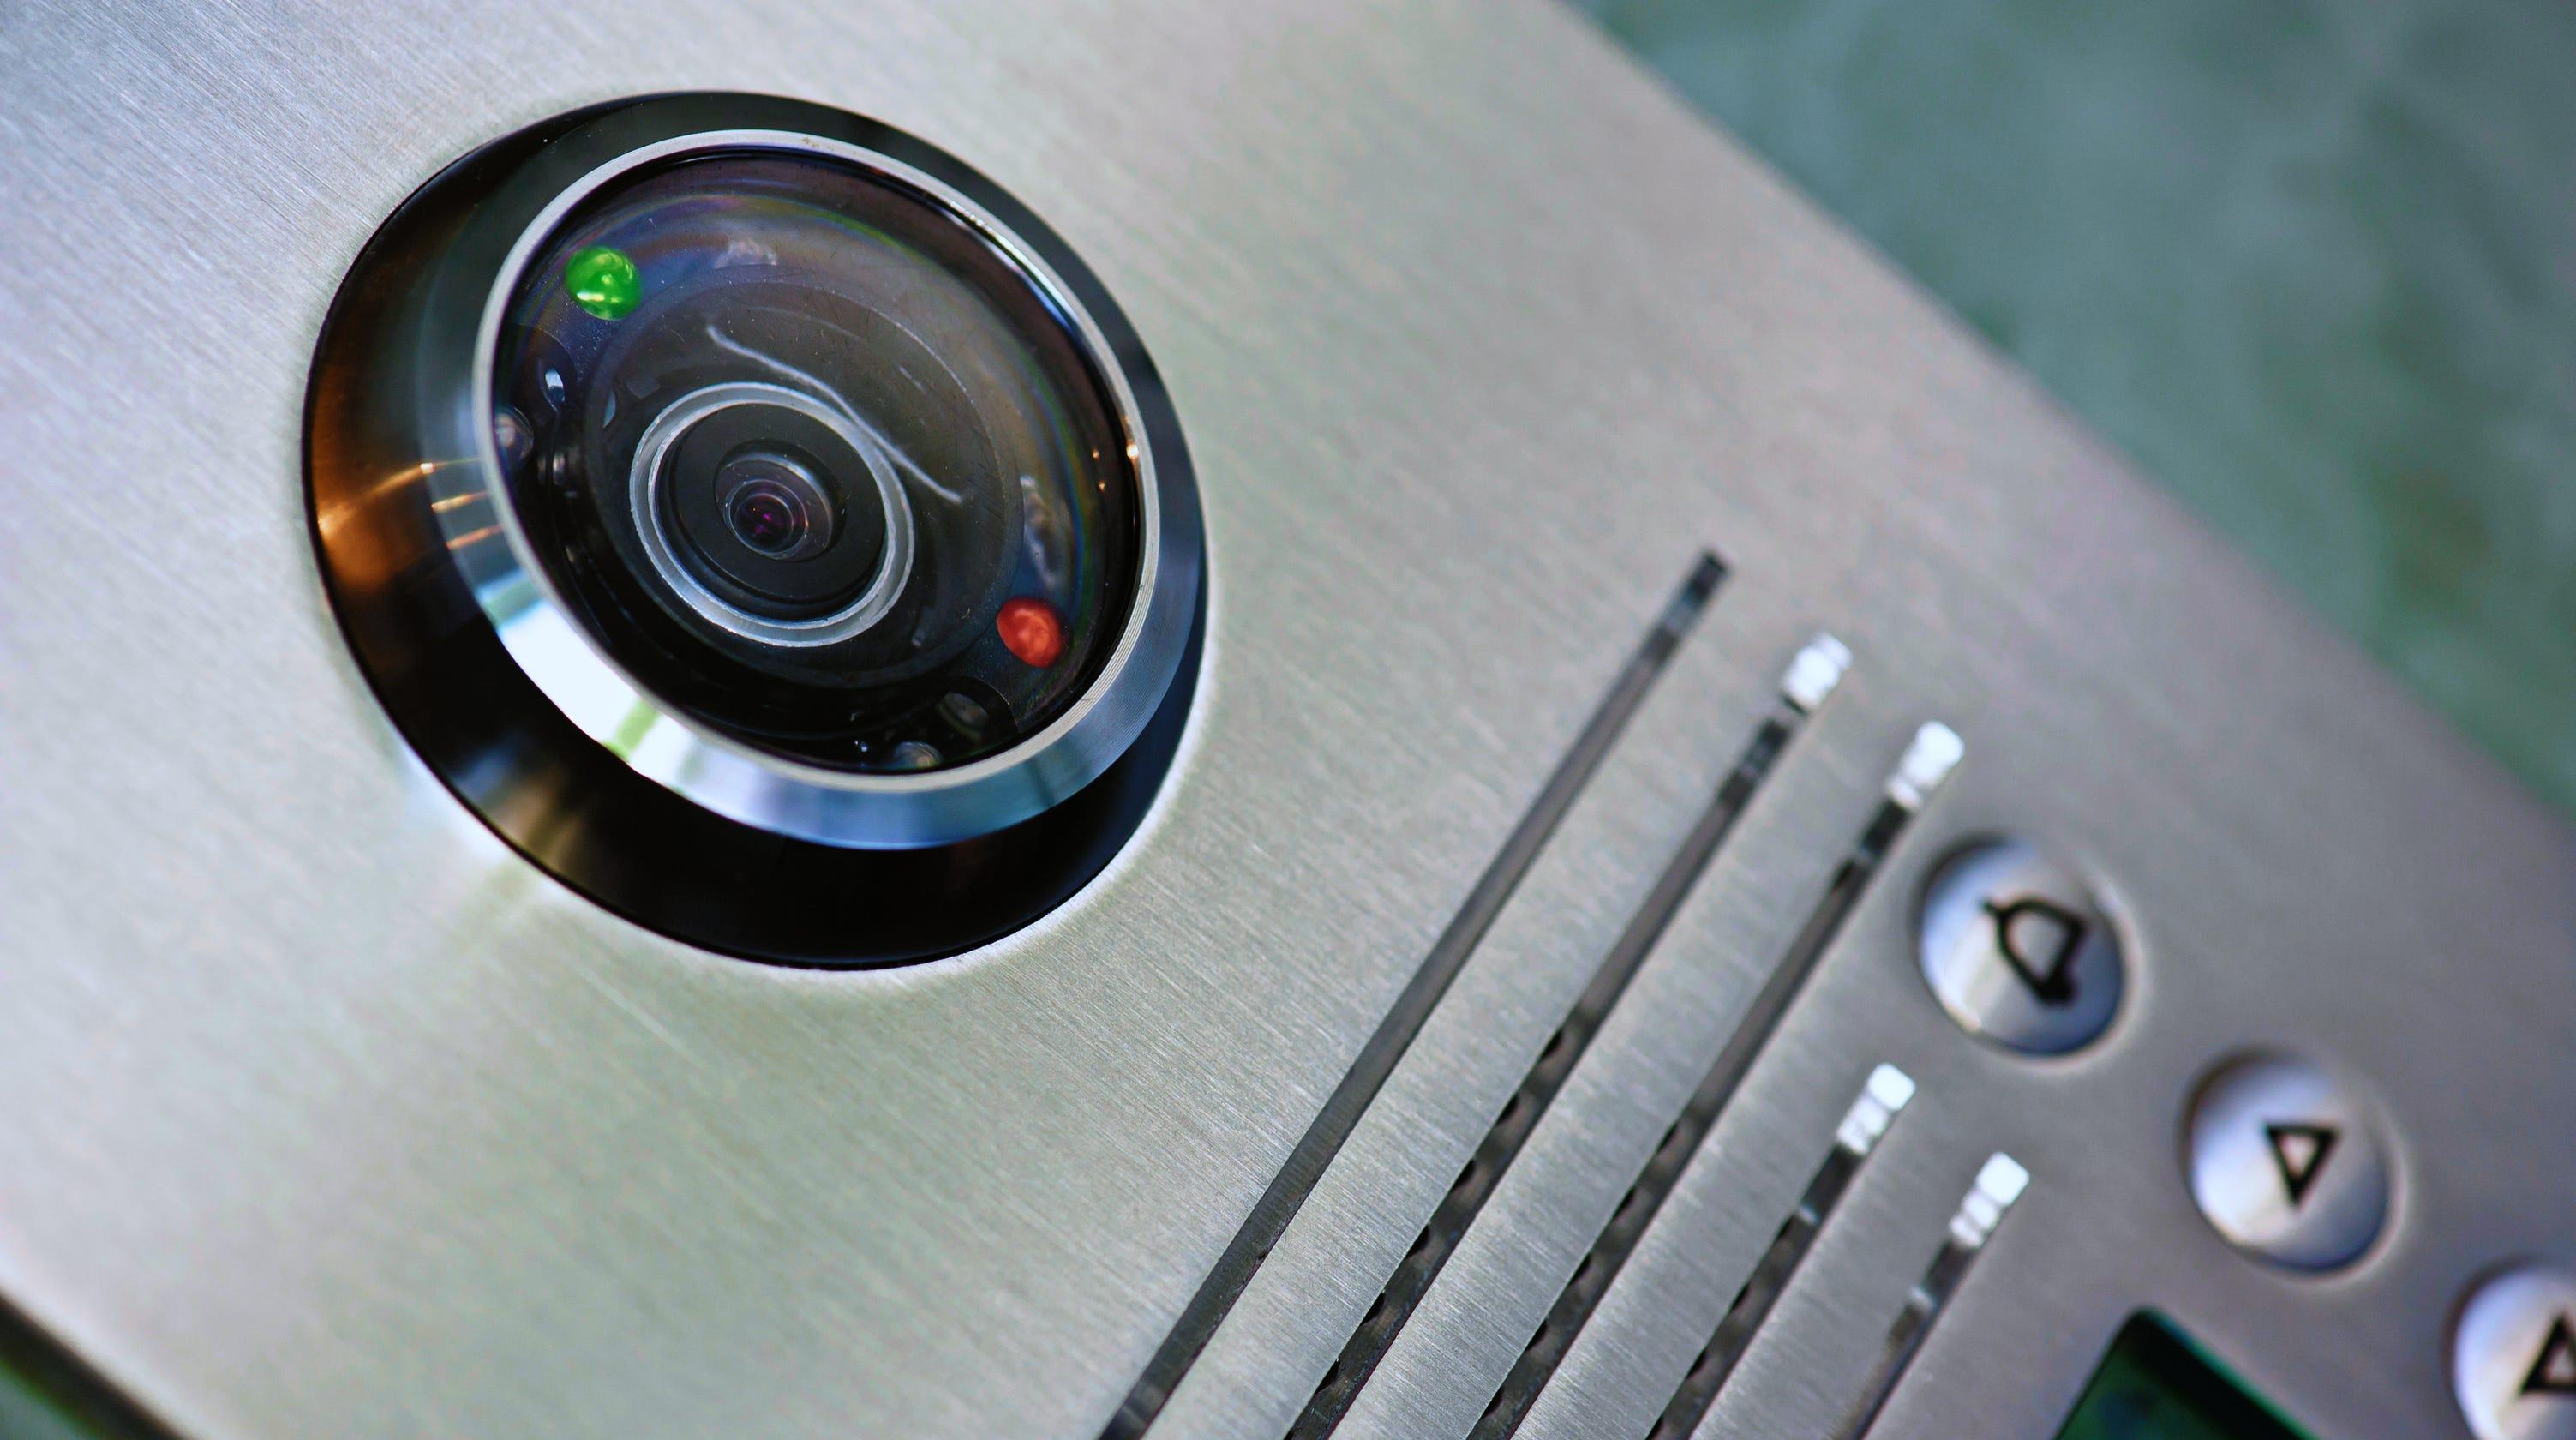 Doorbell cam videos create dilemma for police, neighborhoods